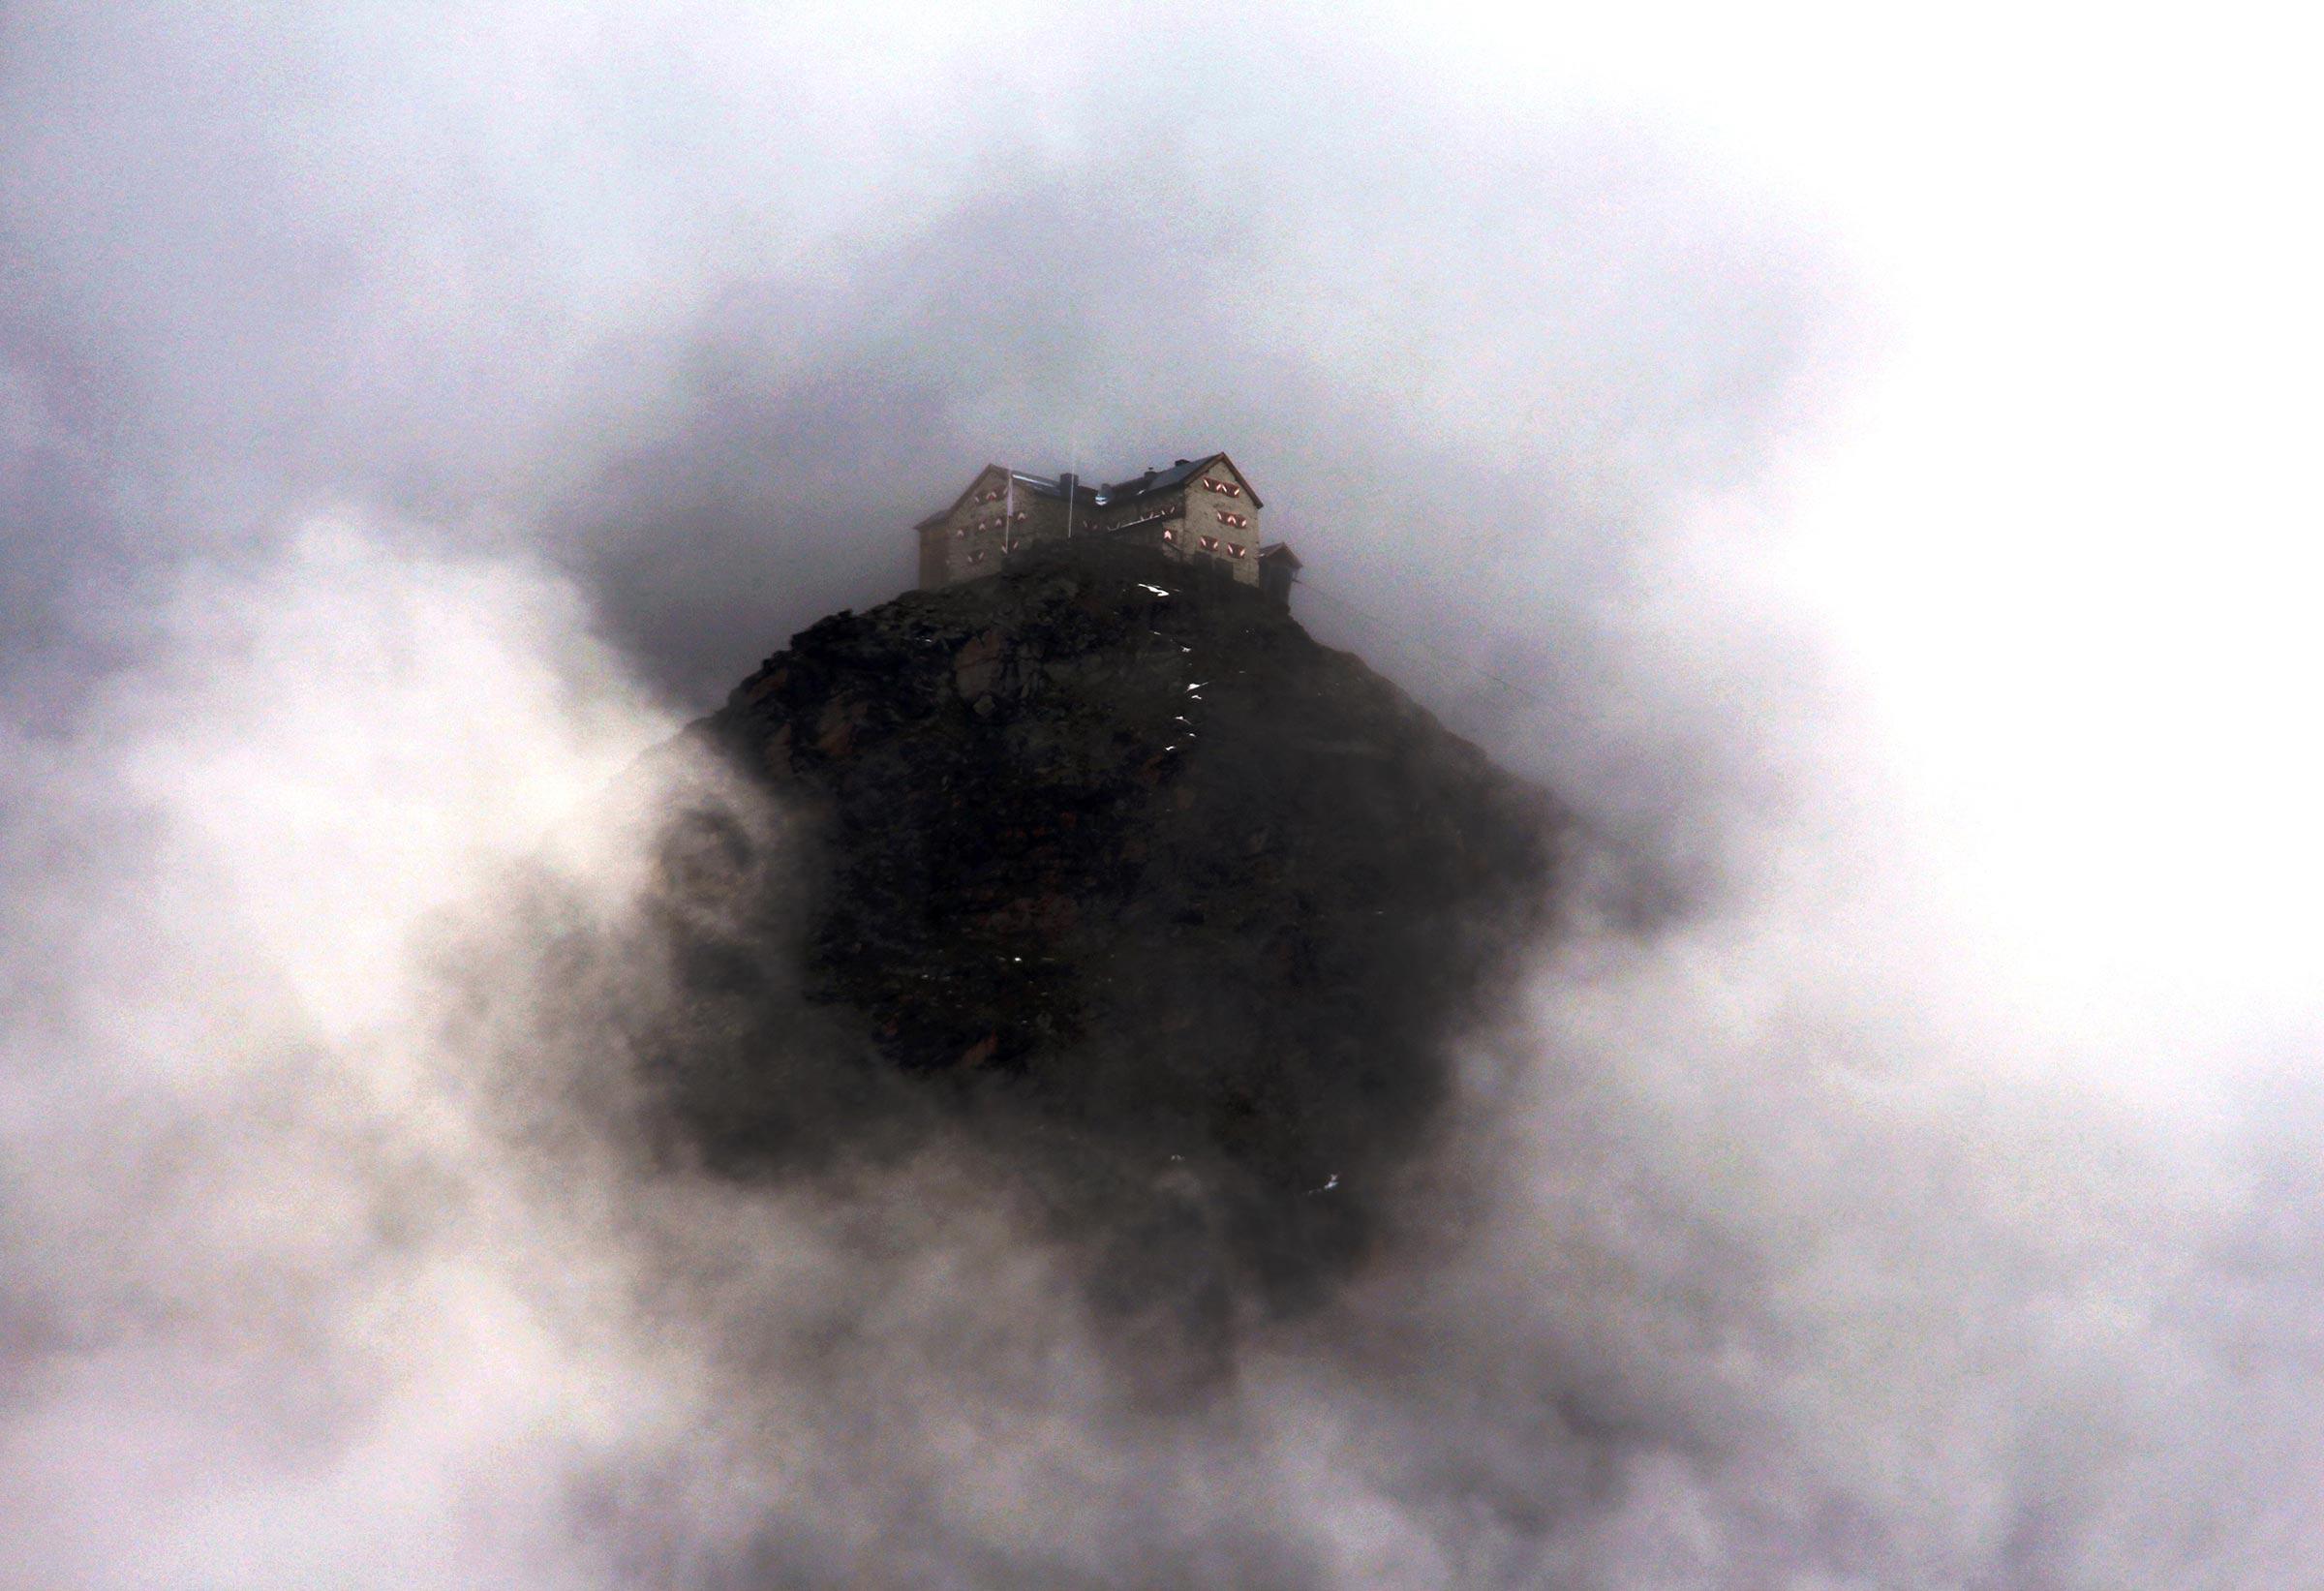 Ramolhaus im Nebel - Piccard Rundweg Obergurgl-Hochgurgl